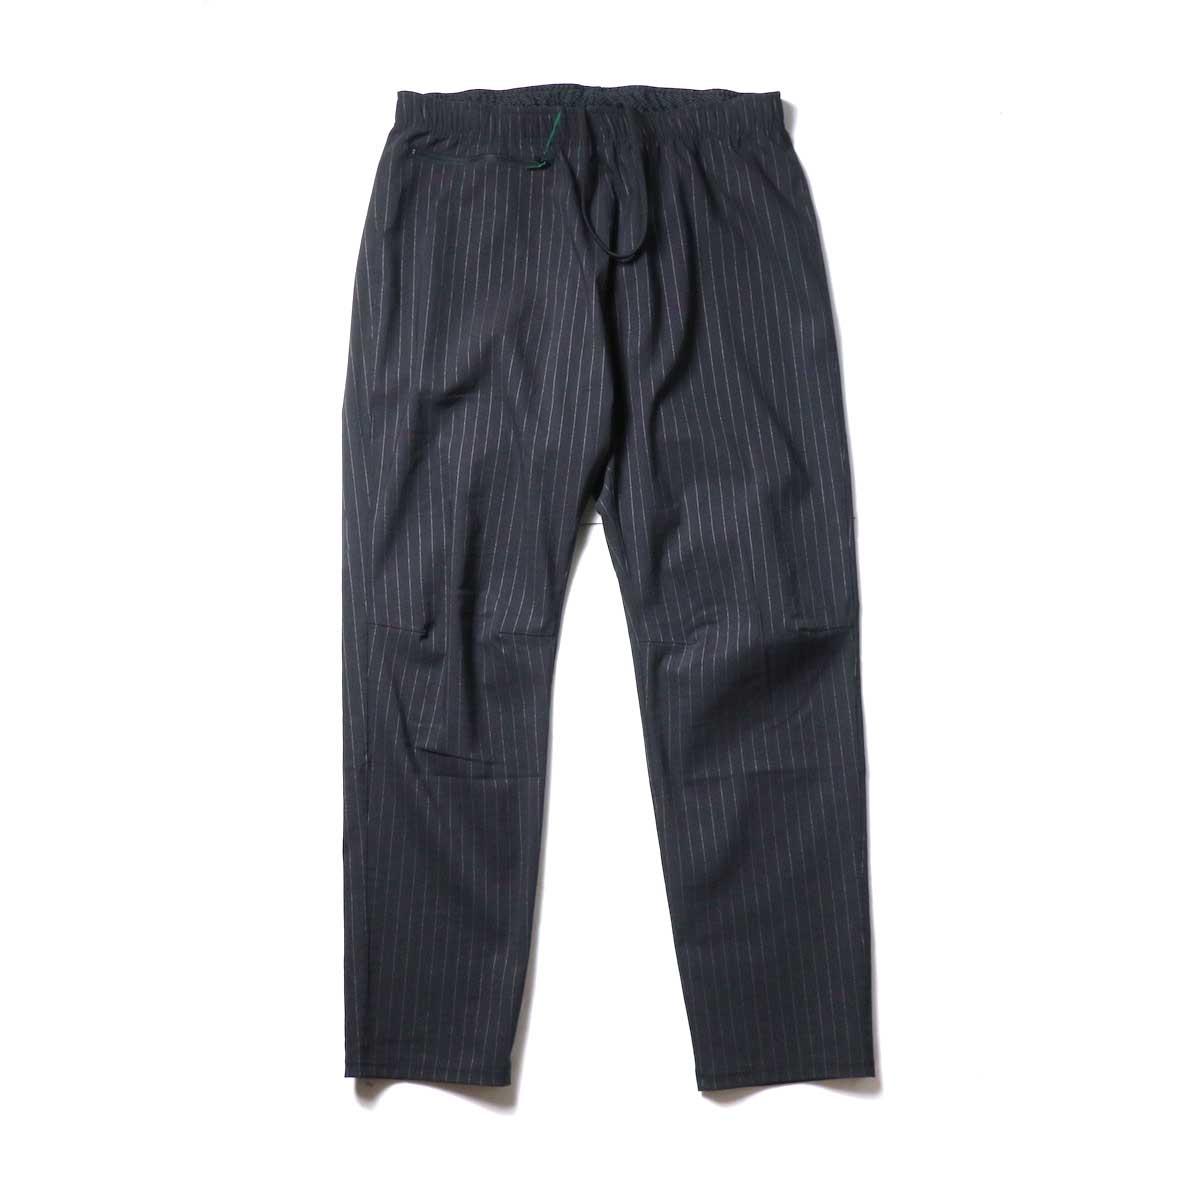 South2 West8 / 1P Cycle Pant - Stripe Cloth (Black)